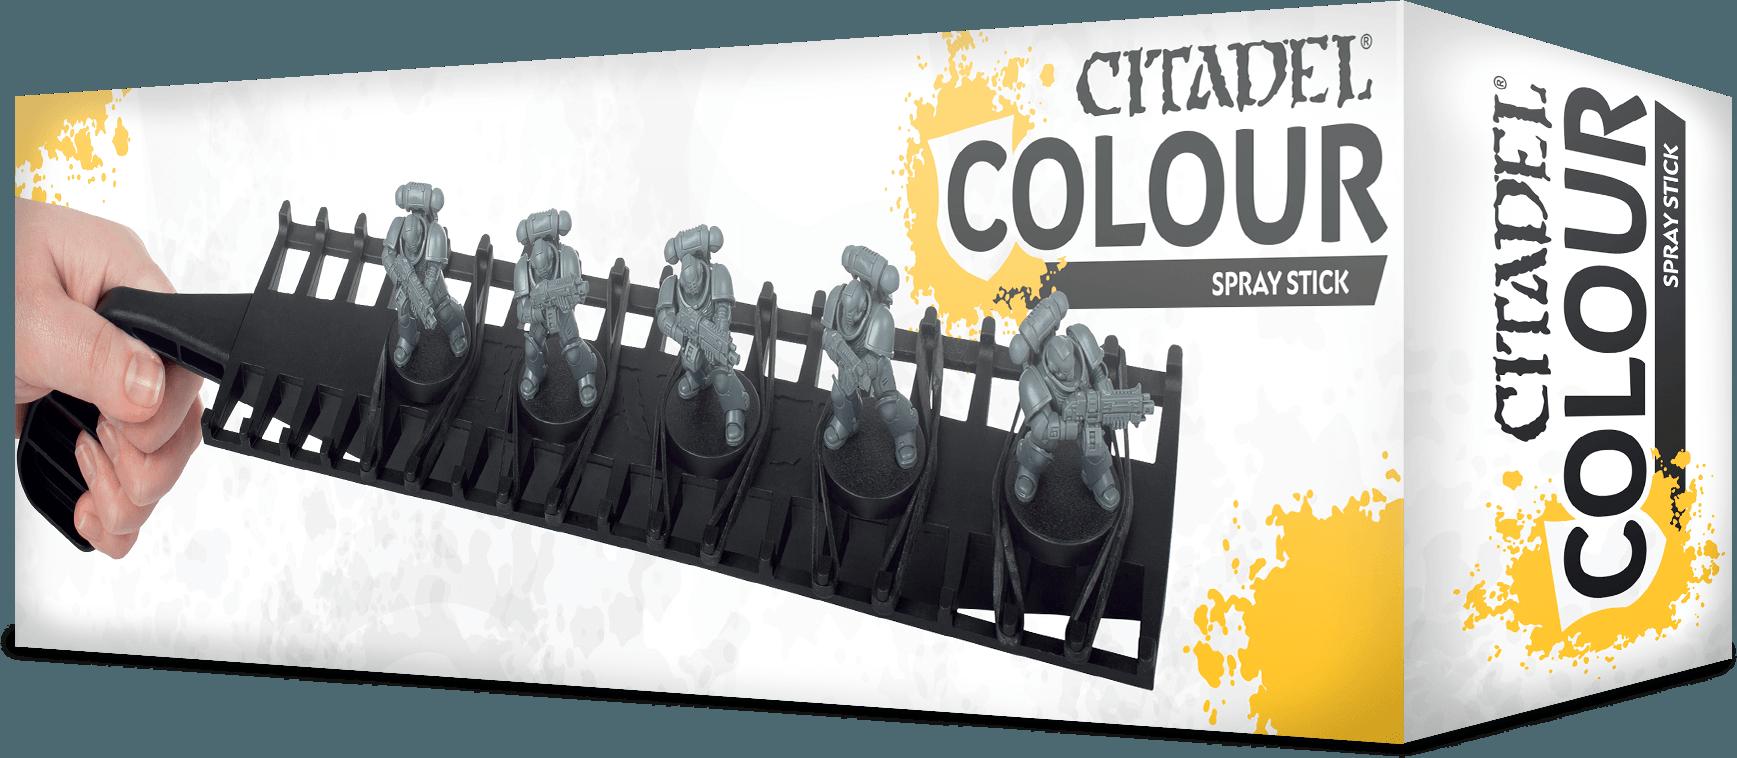 https___trade.games-workshop.com_assets_2019_11_Citadel-Colour-Sprey-Stick